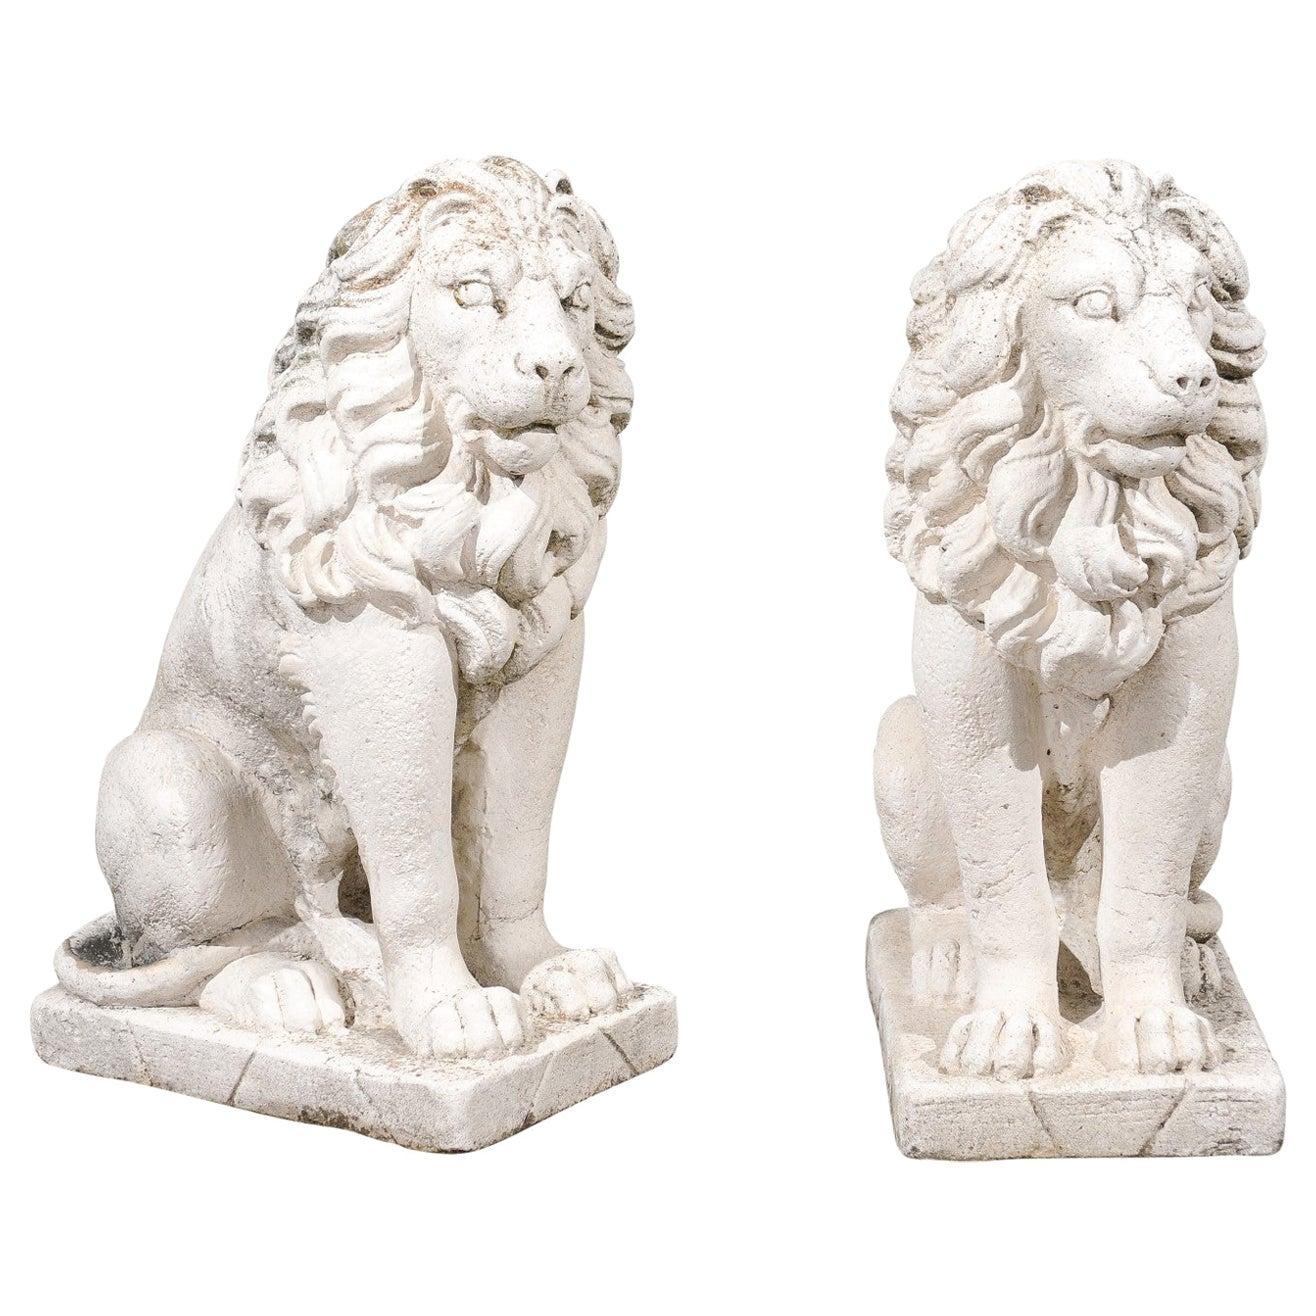 Pair of Italian 20th Century Reconstituted Stone Seated Lions Sculptures